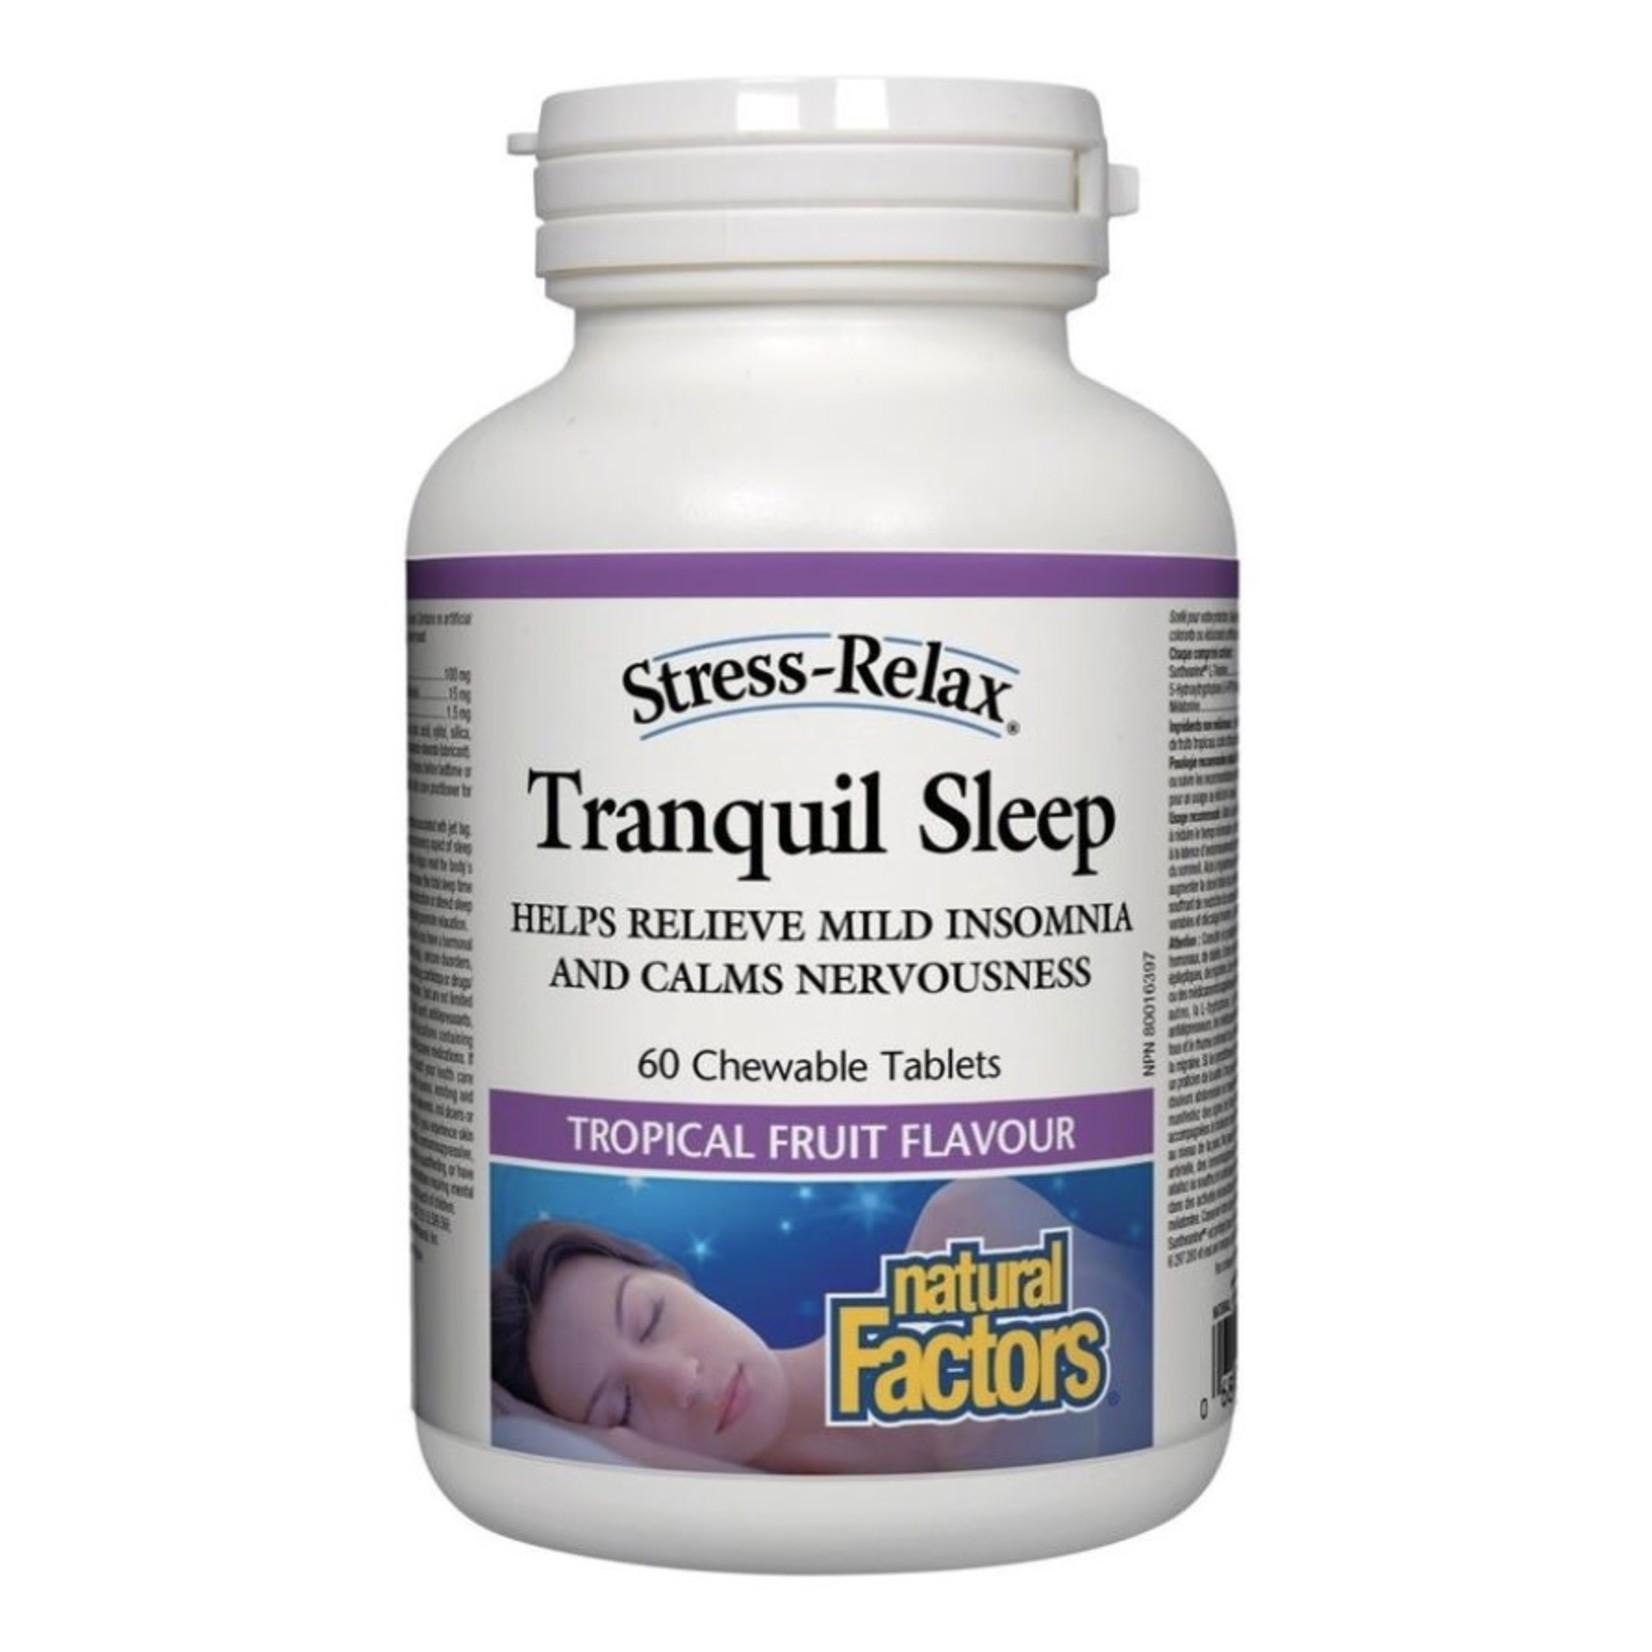 Natural Factors Natural Factors Tranquil Sleep 60 tabs